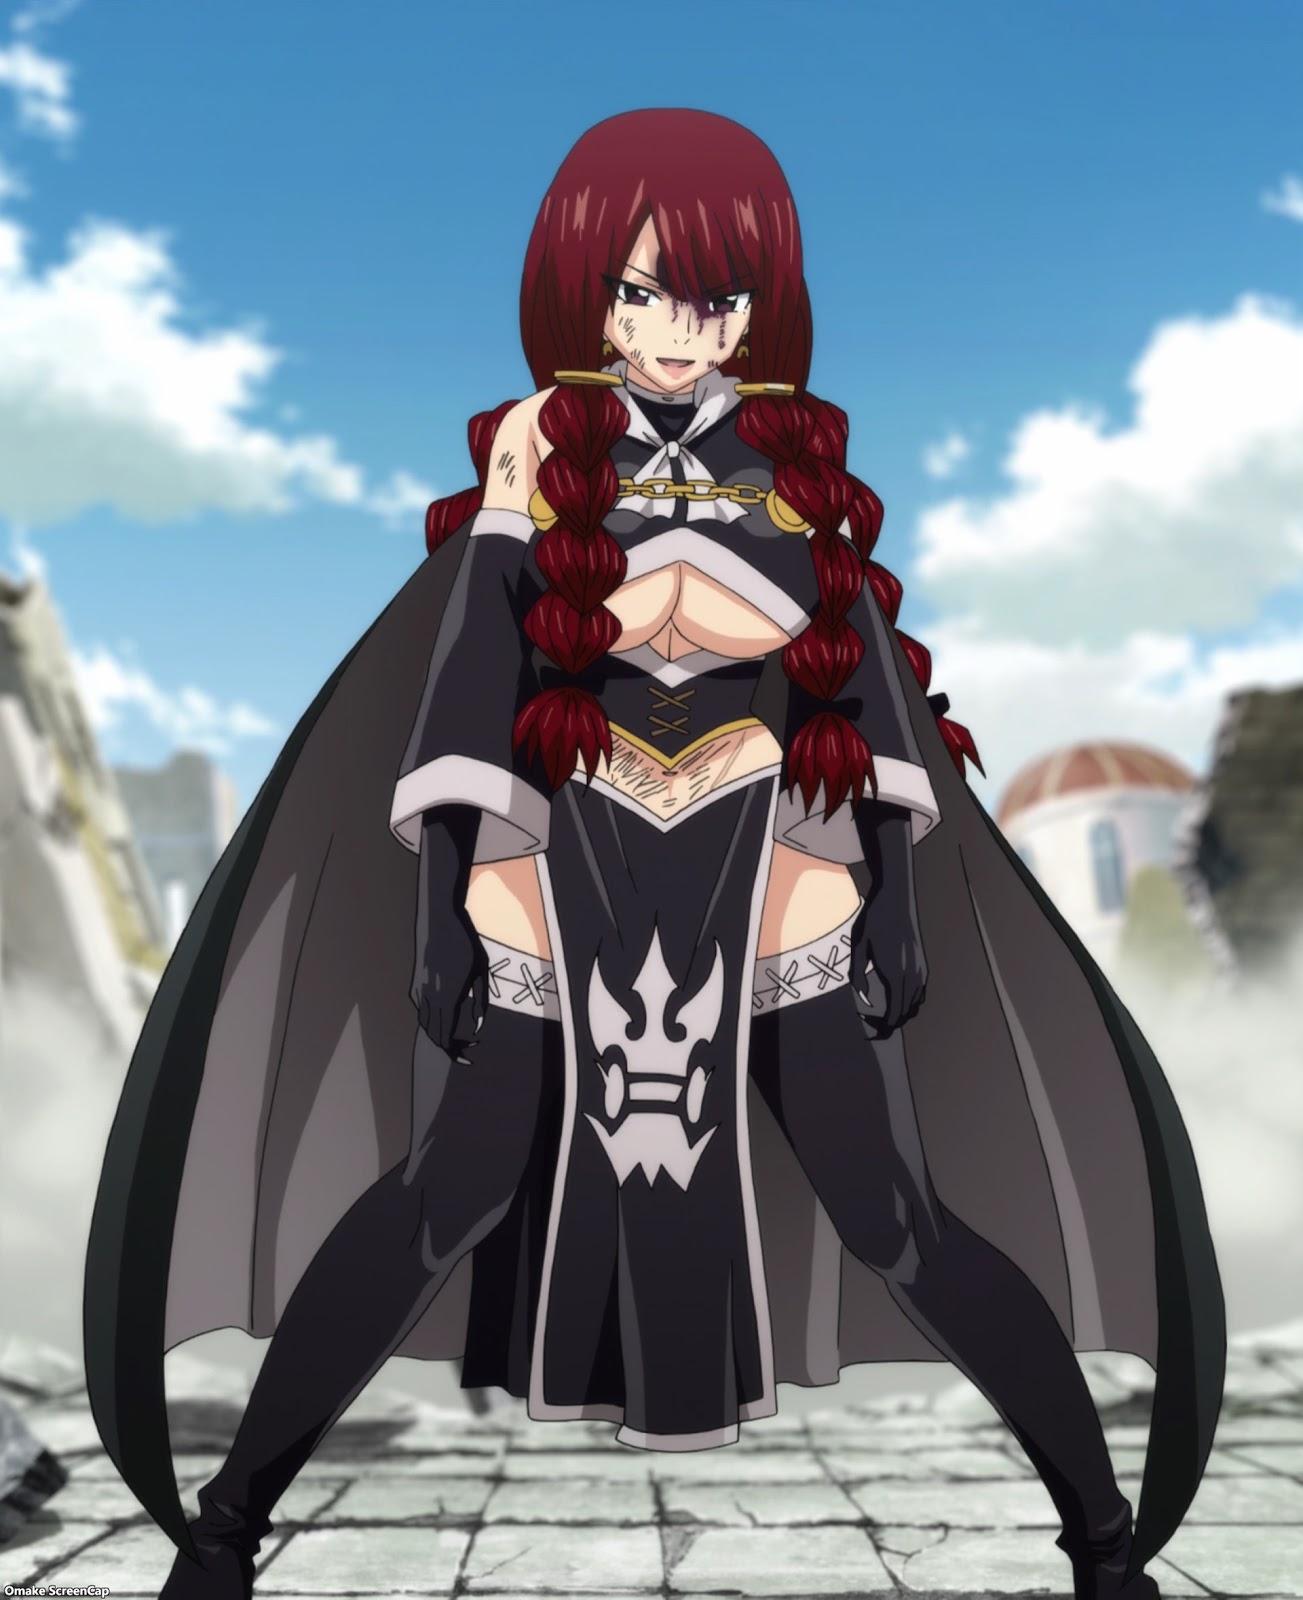 Joeschmo's Gears and Grounds: Omake Gif Anime - Fairy Tail